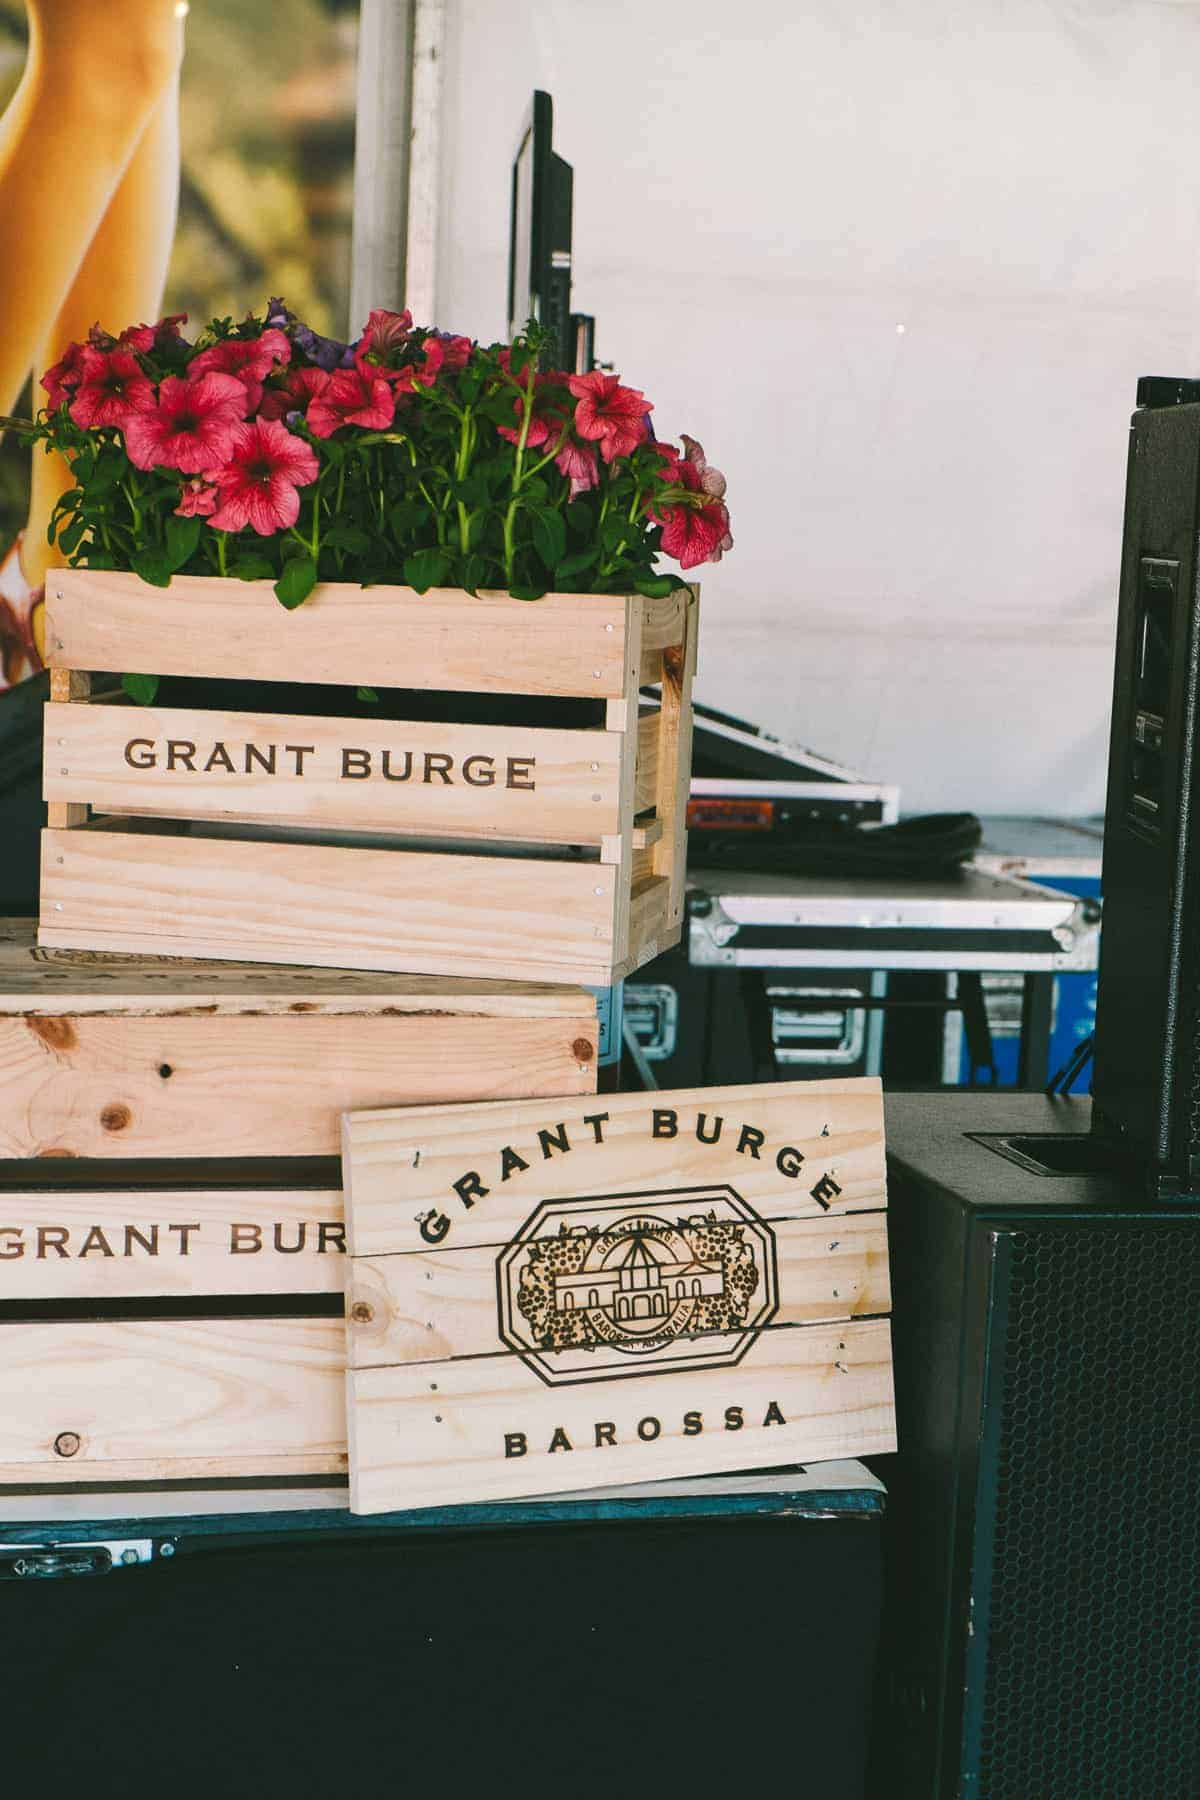 Grant Burge champagne crates